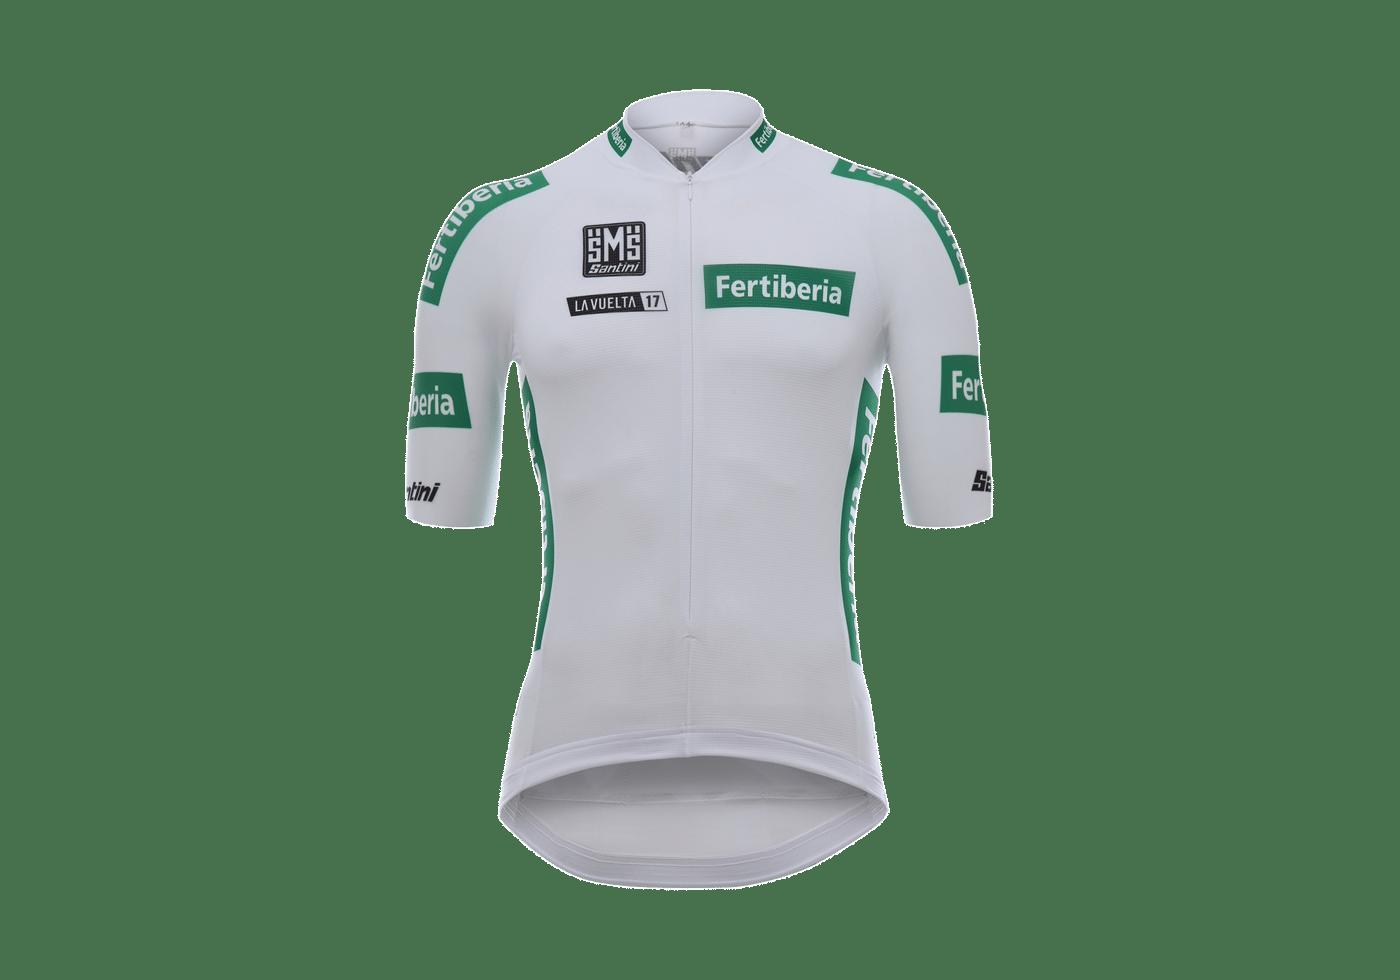 Maillot Blanco La Vuelta 2017 I